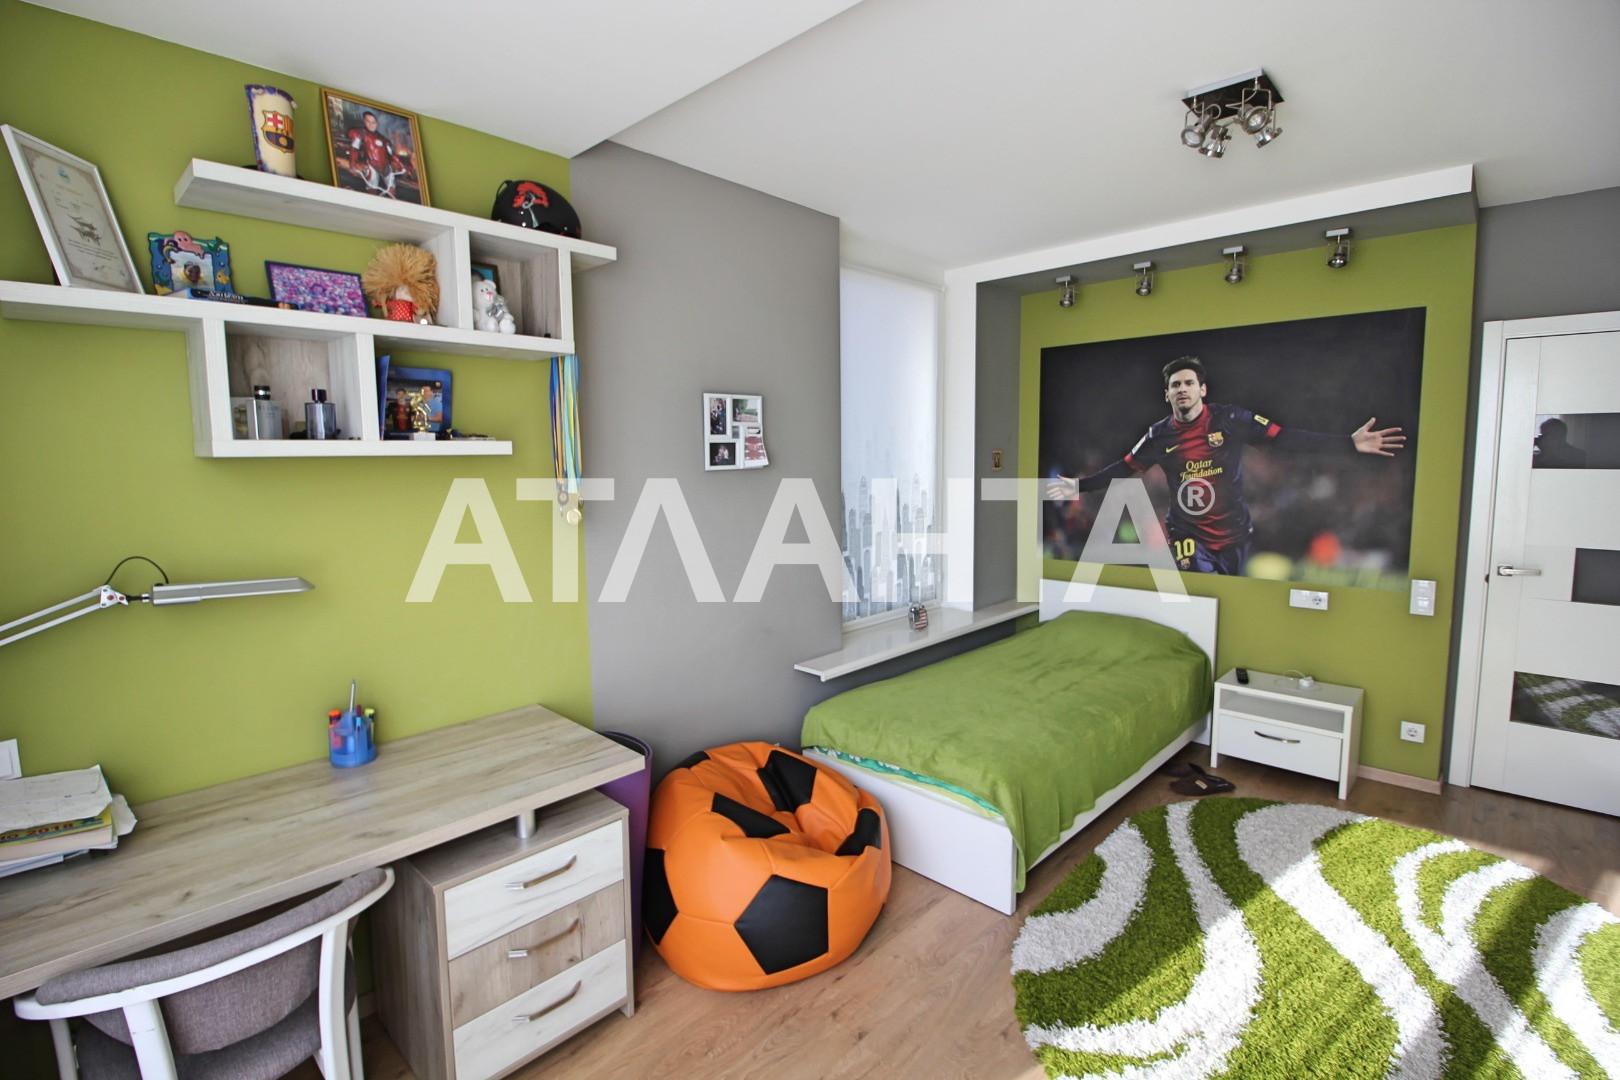 Продается 4-комнатная Квартира на ул. Ул. Богатырская — 175 000 у.е. (фото №7)